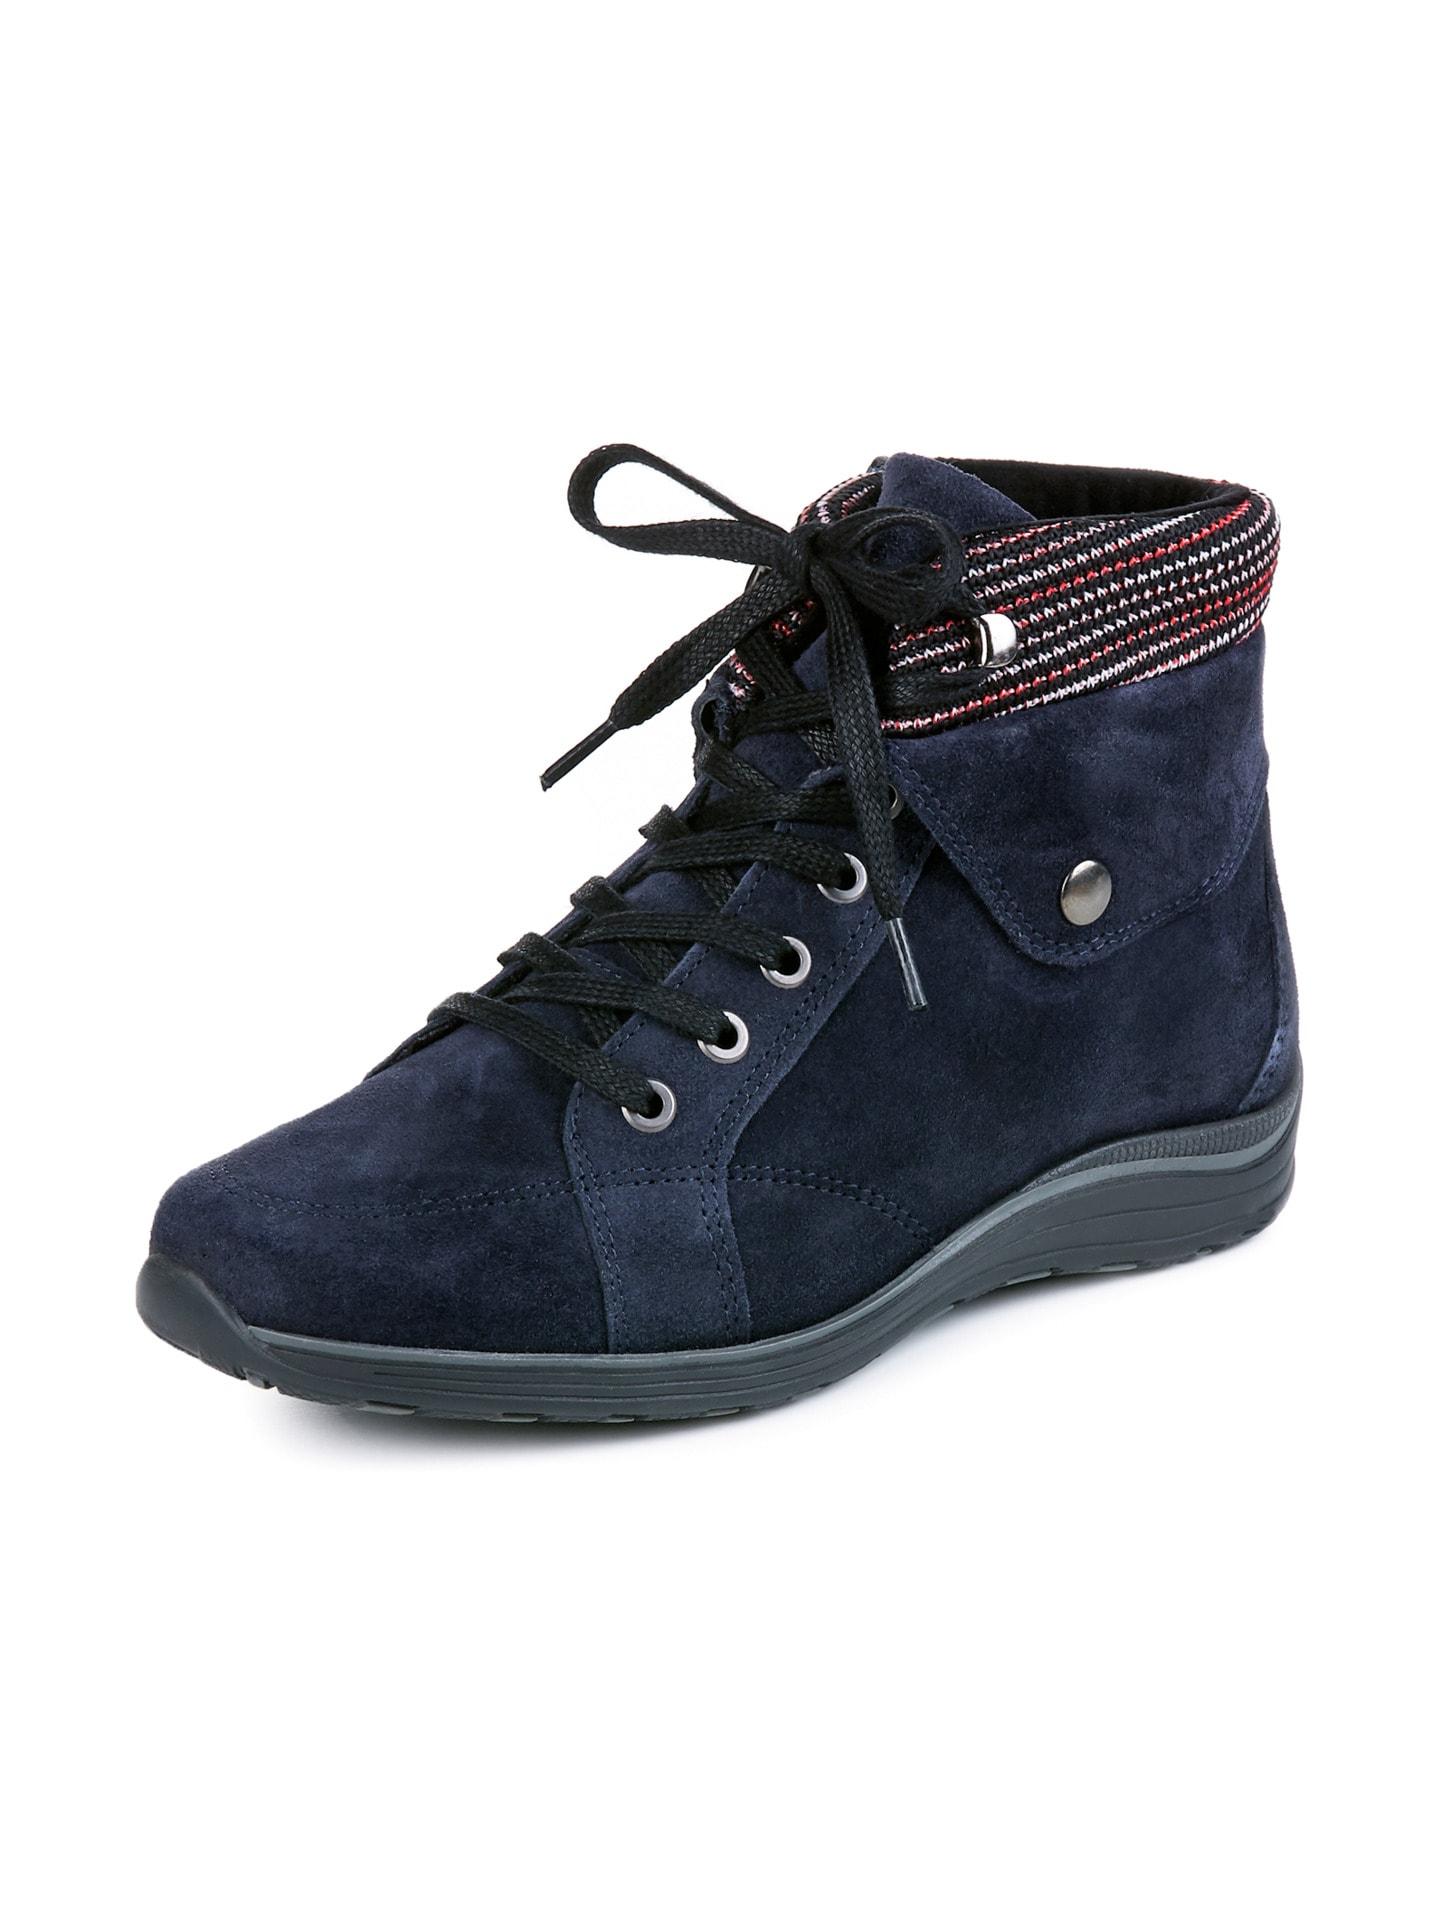 Avena Damen Thermo-Boots Kuschelschaft Blau 45-7759-3